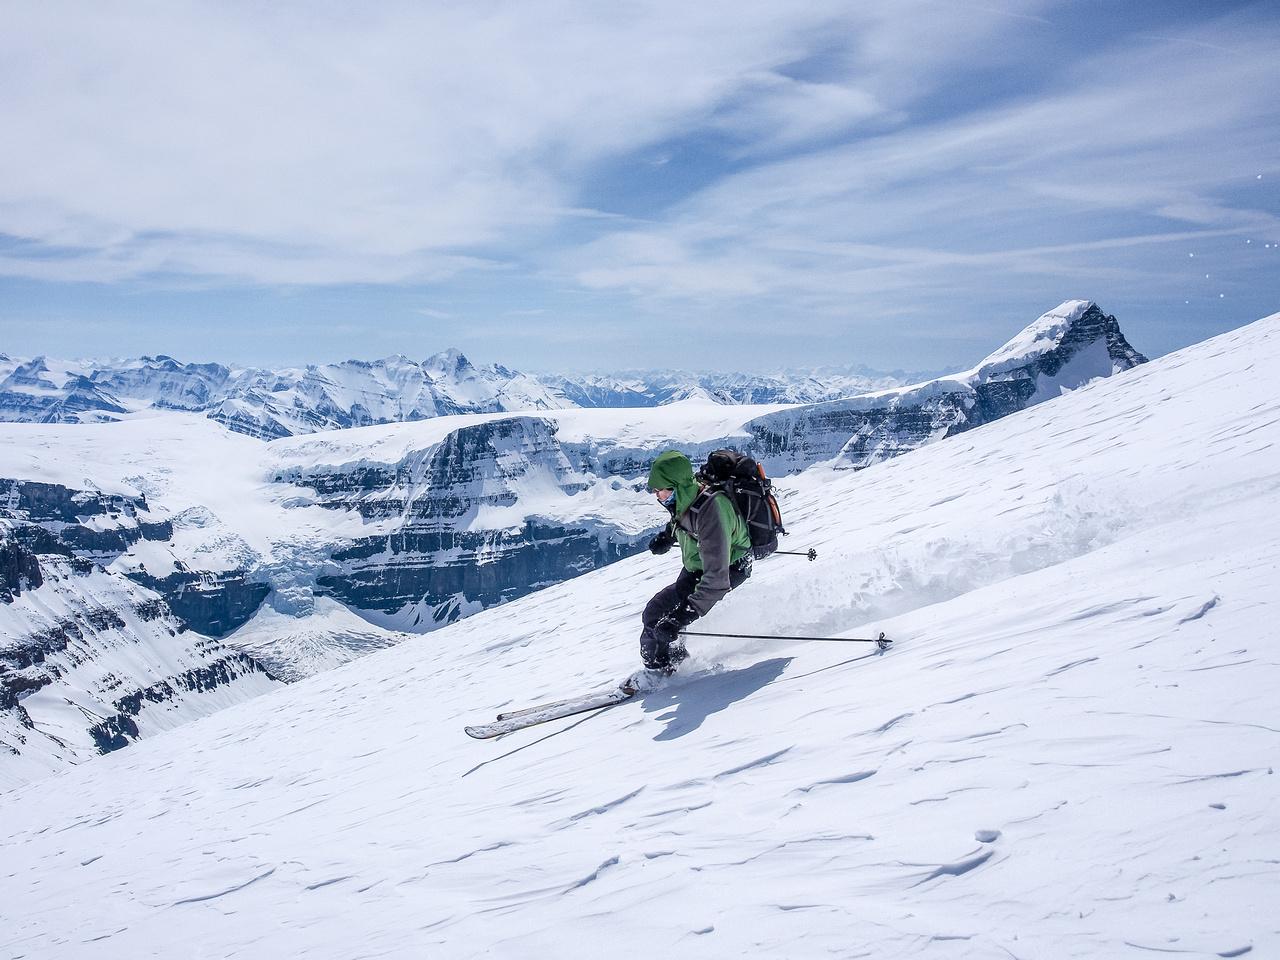 JW skis the south ridge of North Twin.